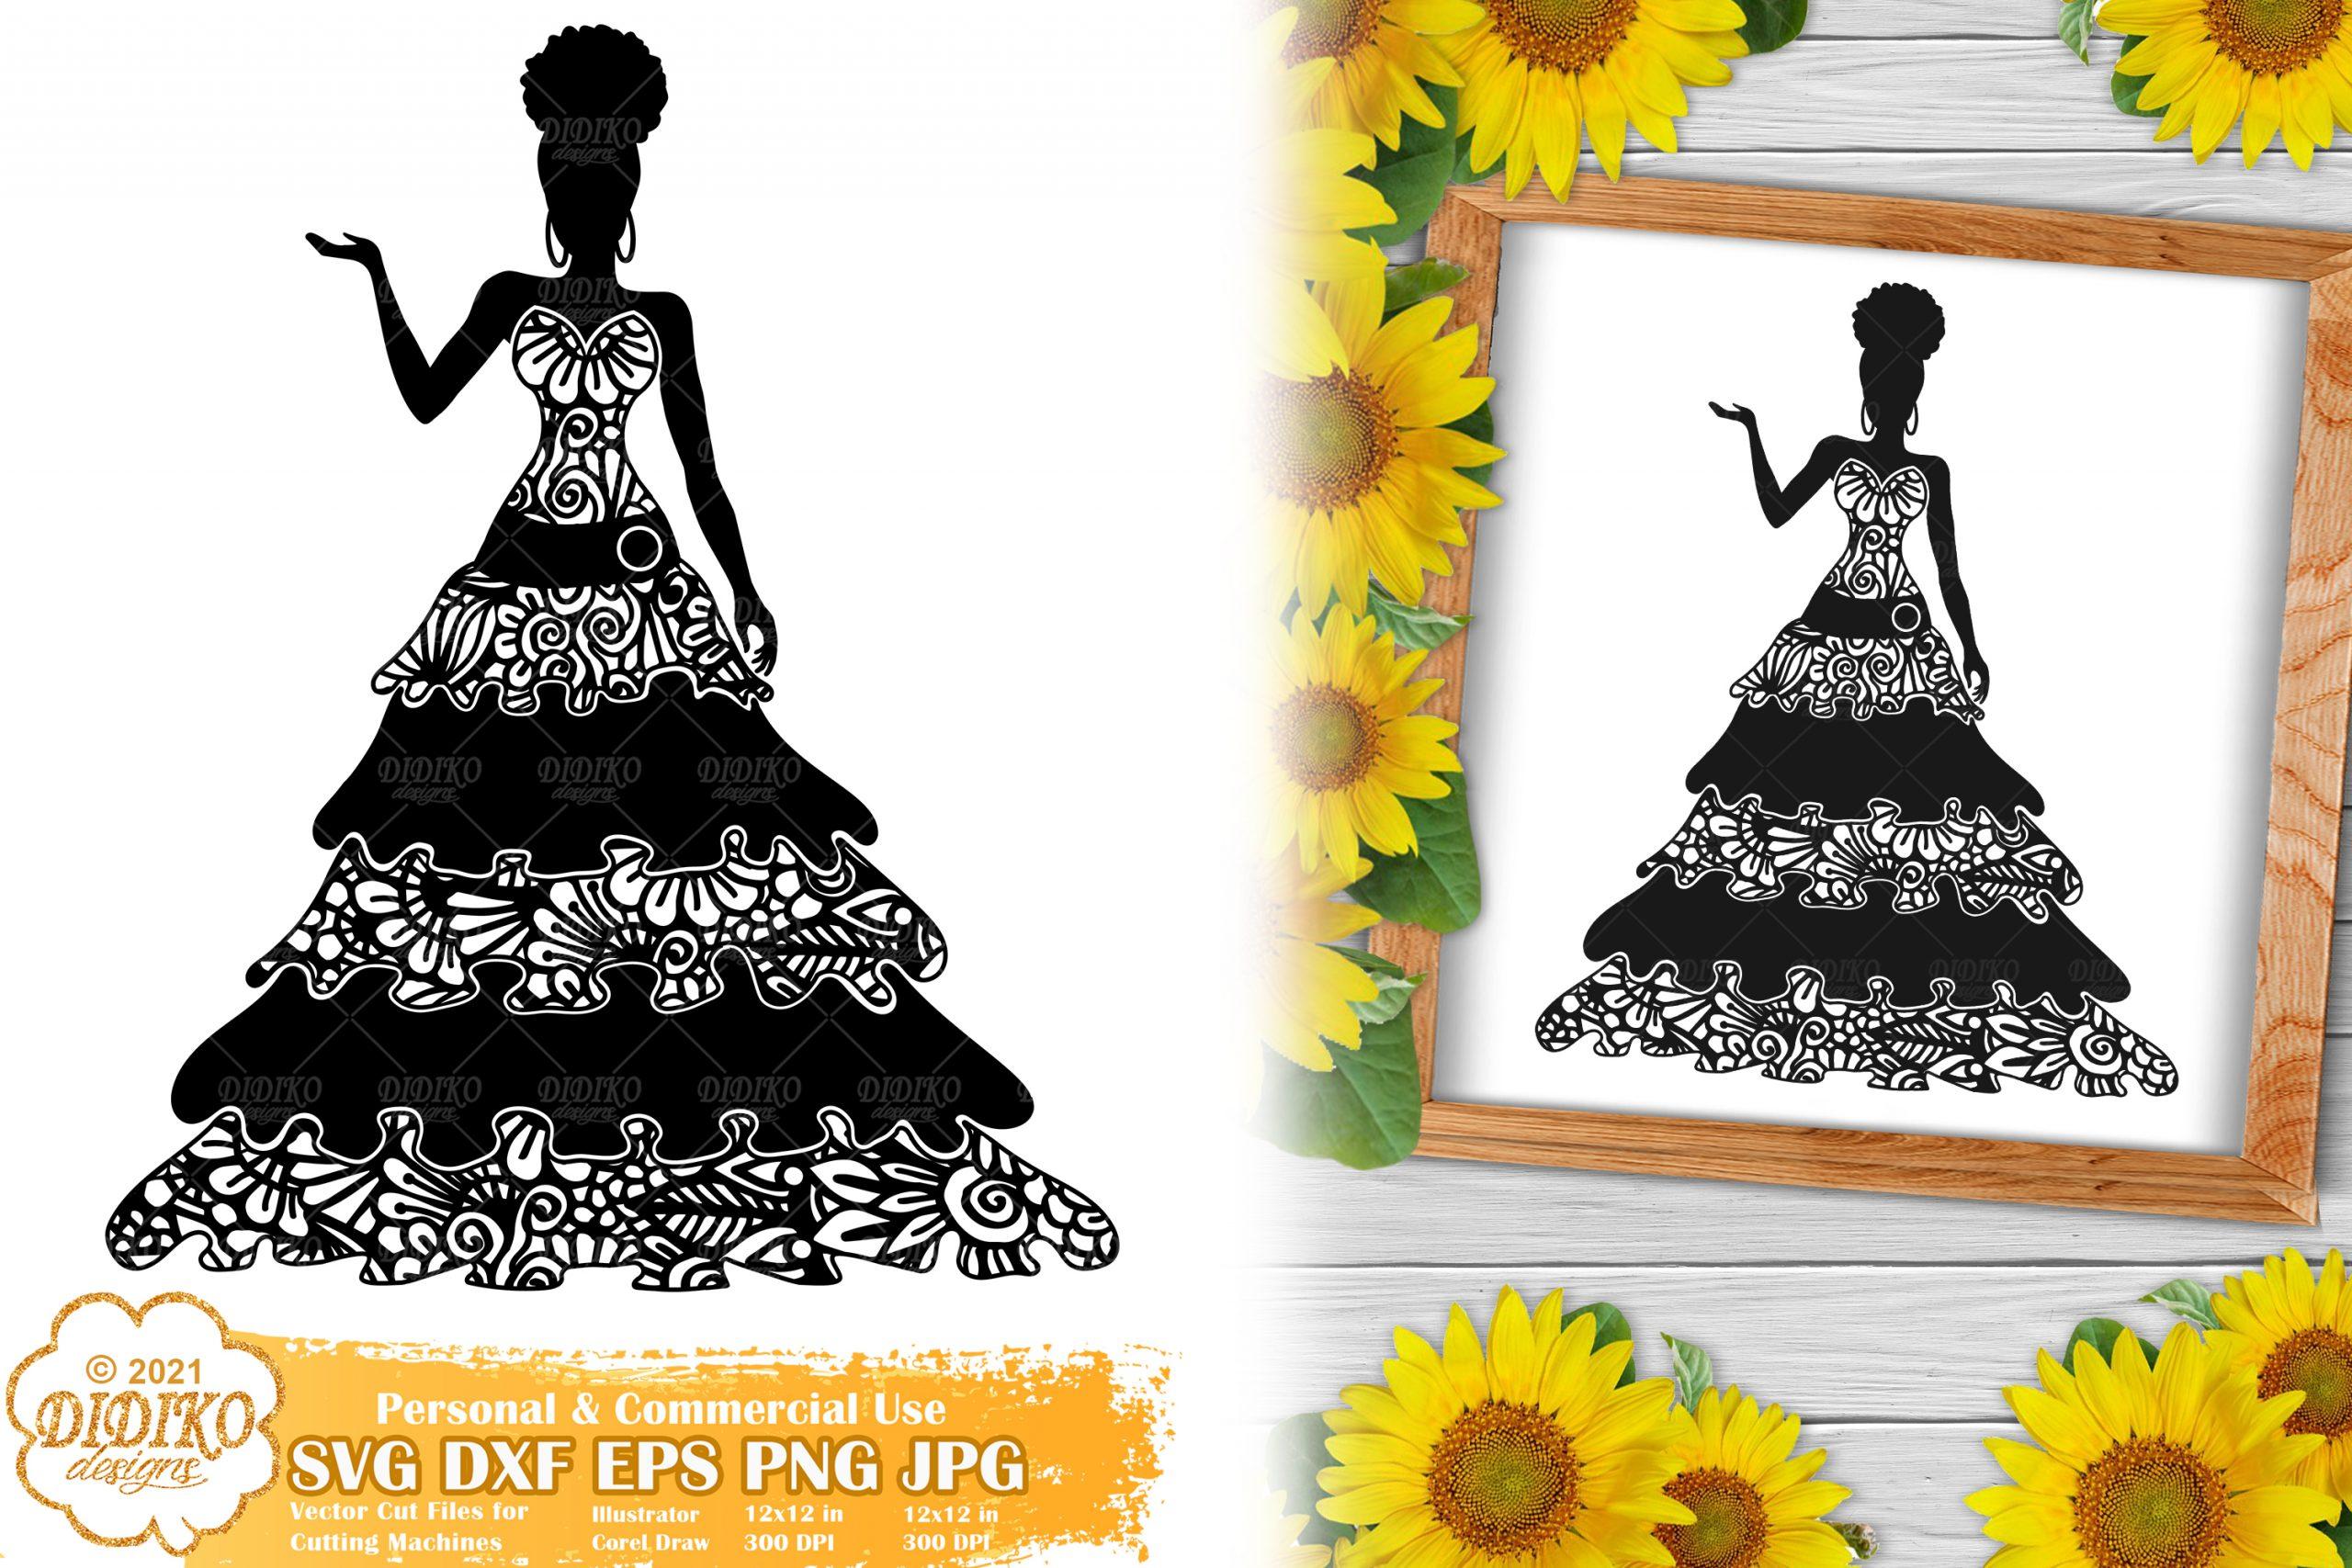 Zentangle Woman SVG #5